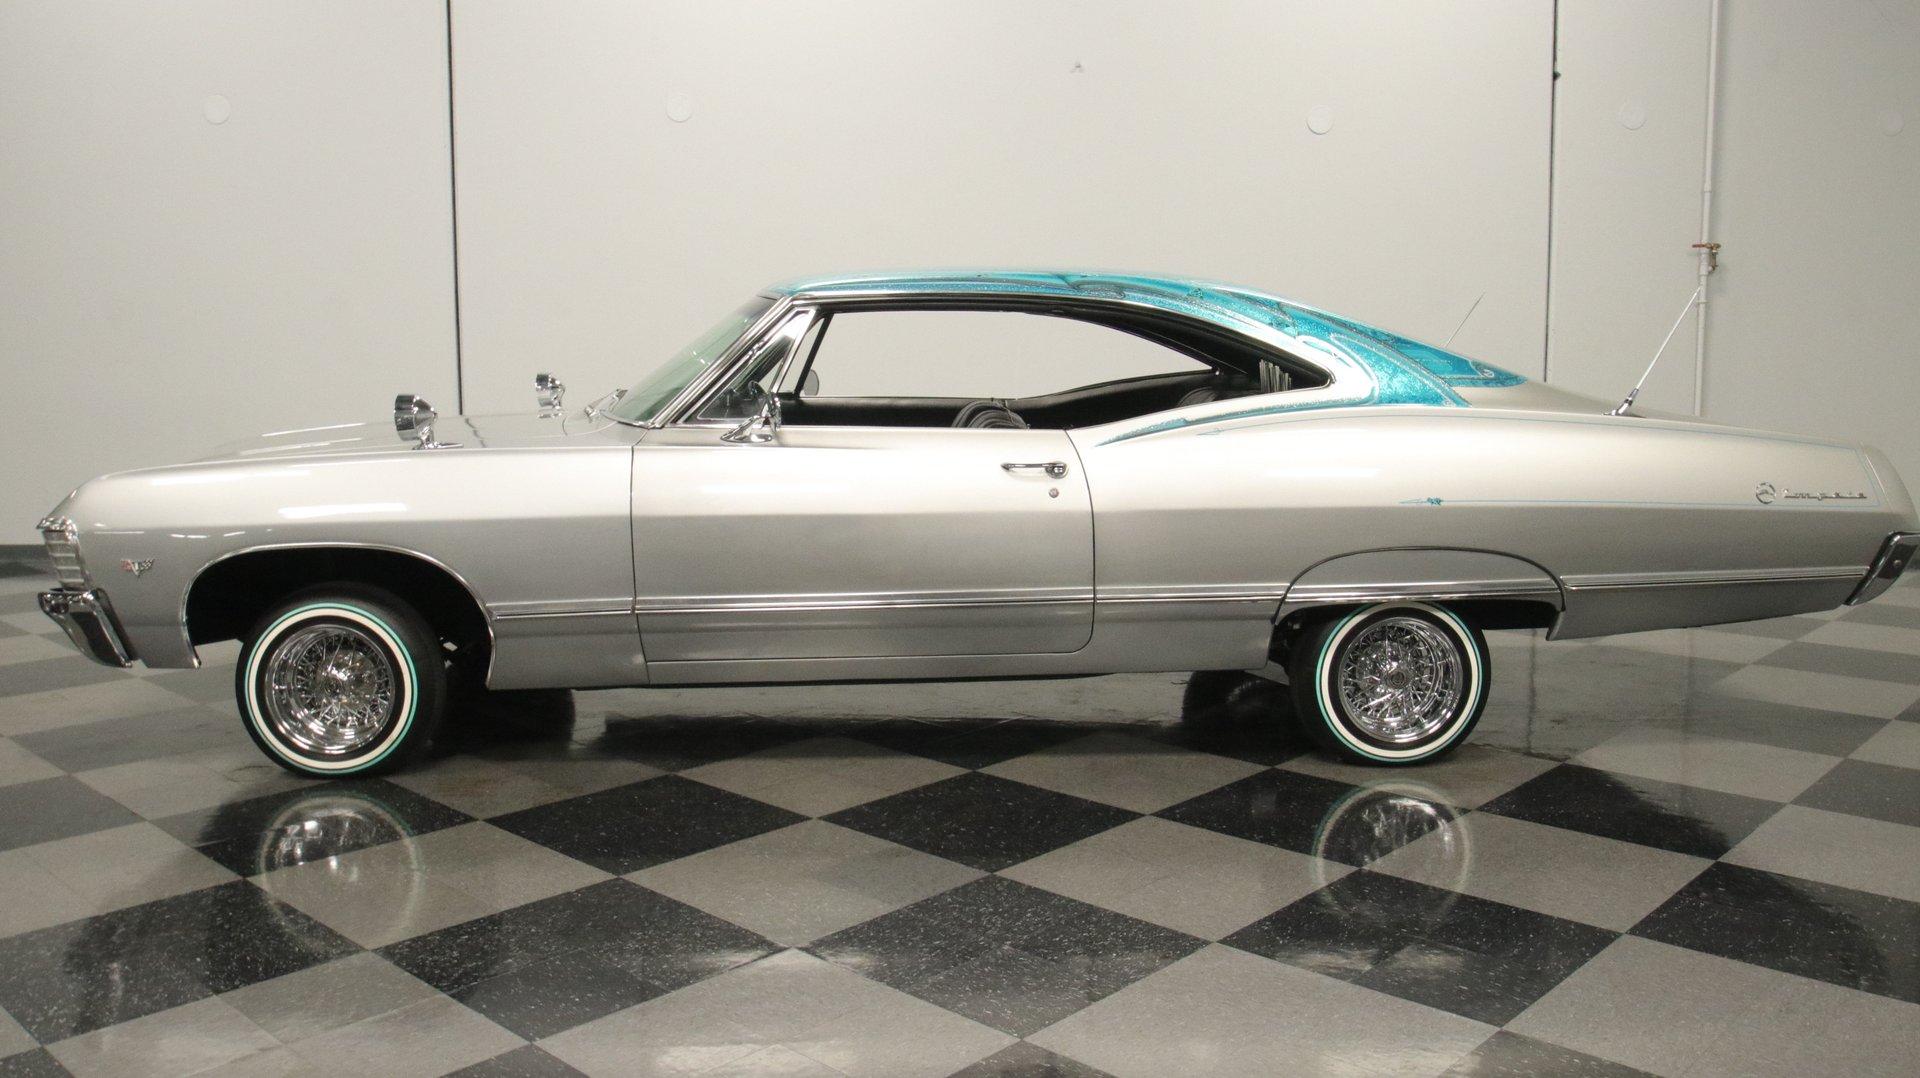 1967 chevrolet impala lowrider